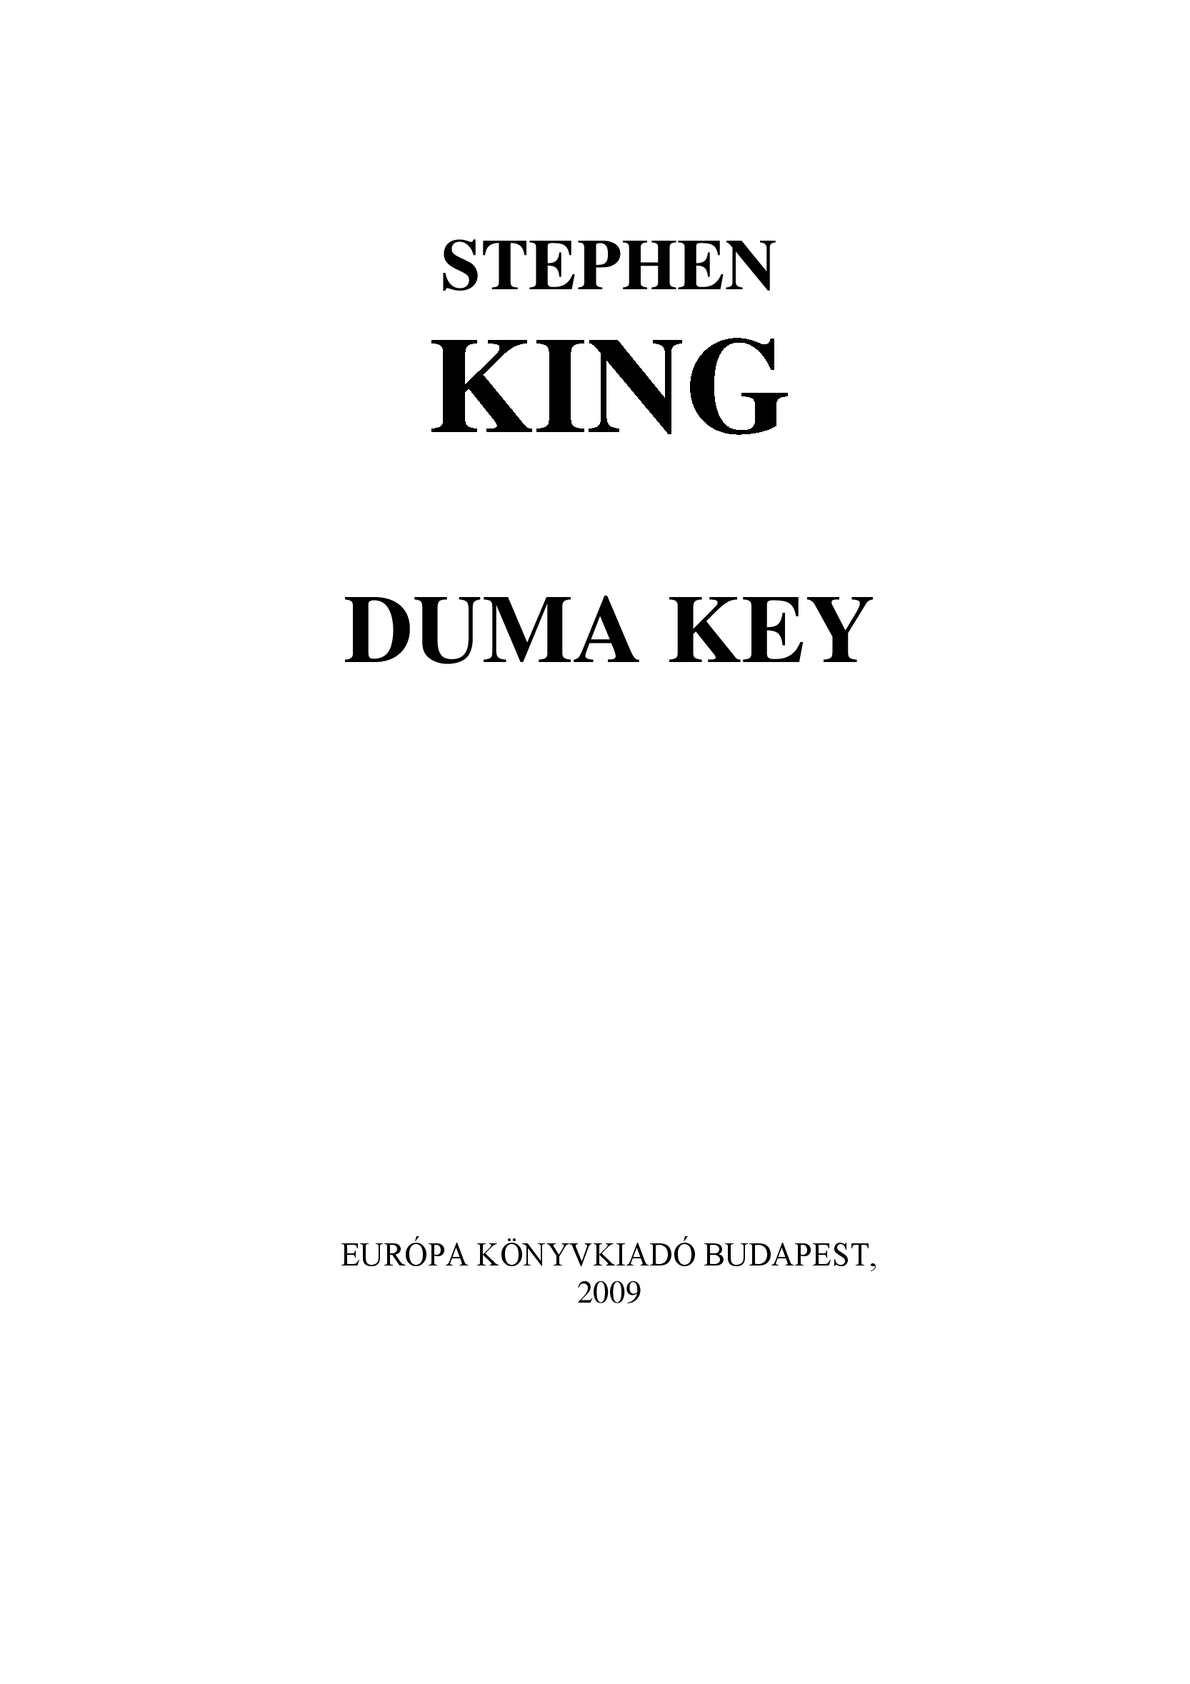 Calaméo - Stephen King - Duma Key 164cea3b8f